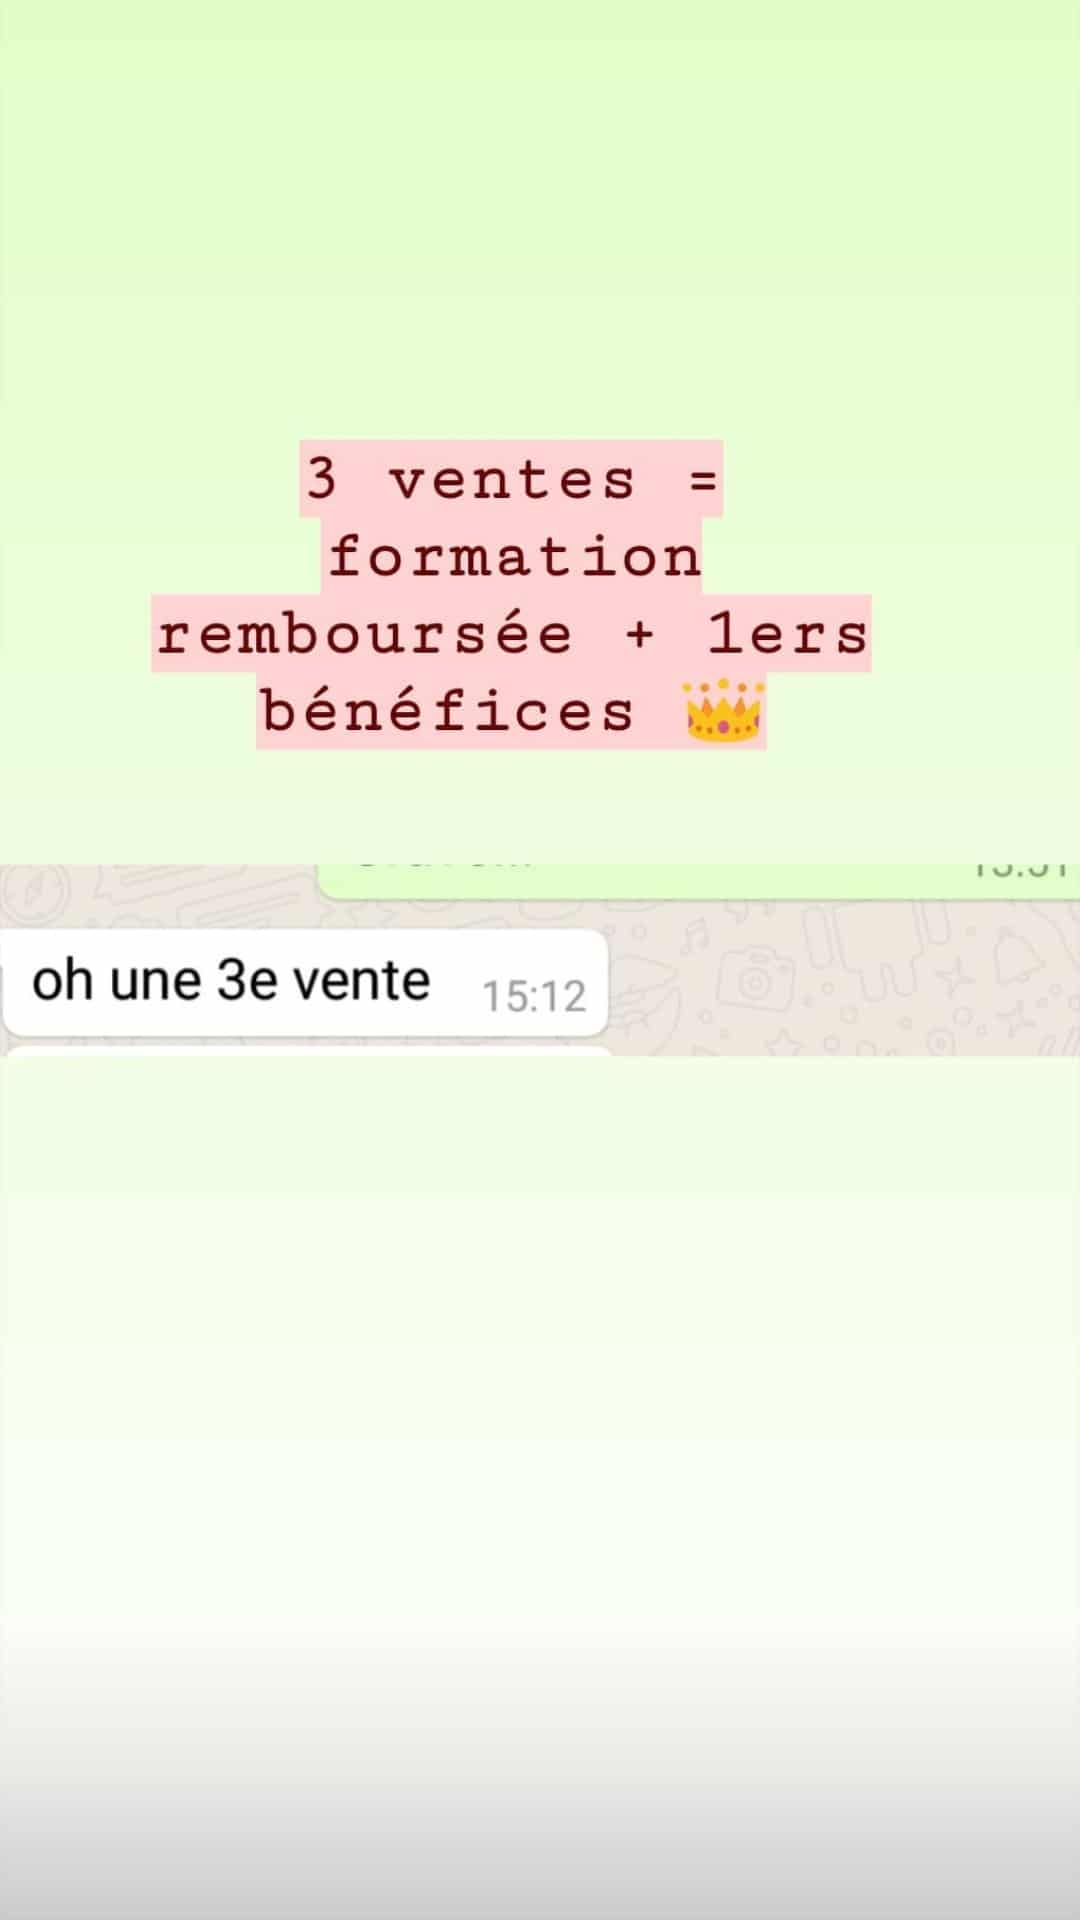 Avis-Les-Reines-Affiliation_20200605_084536